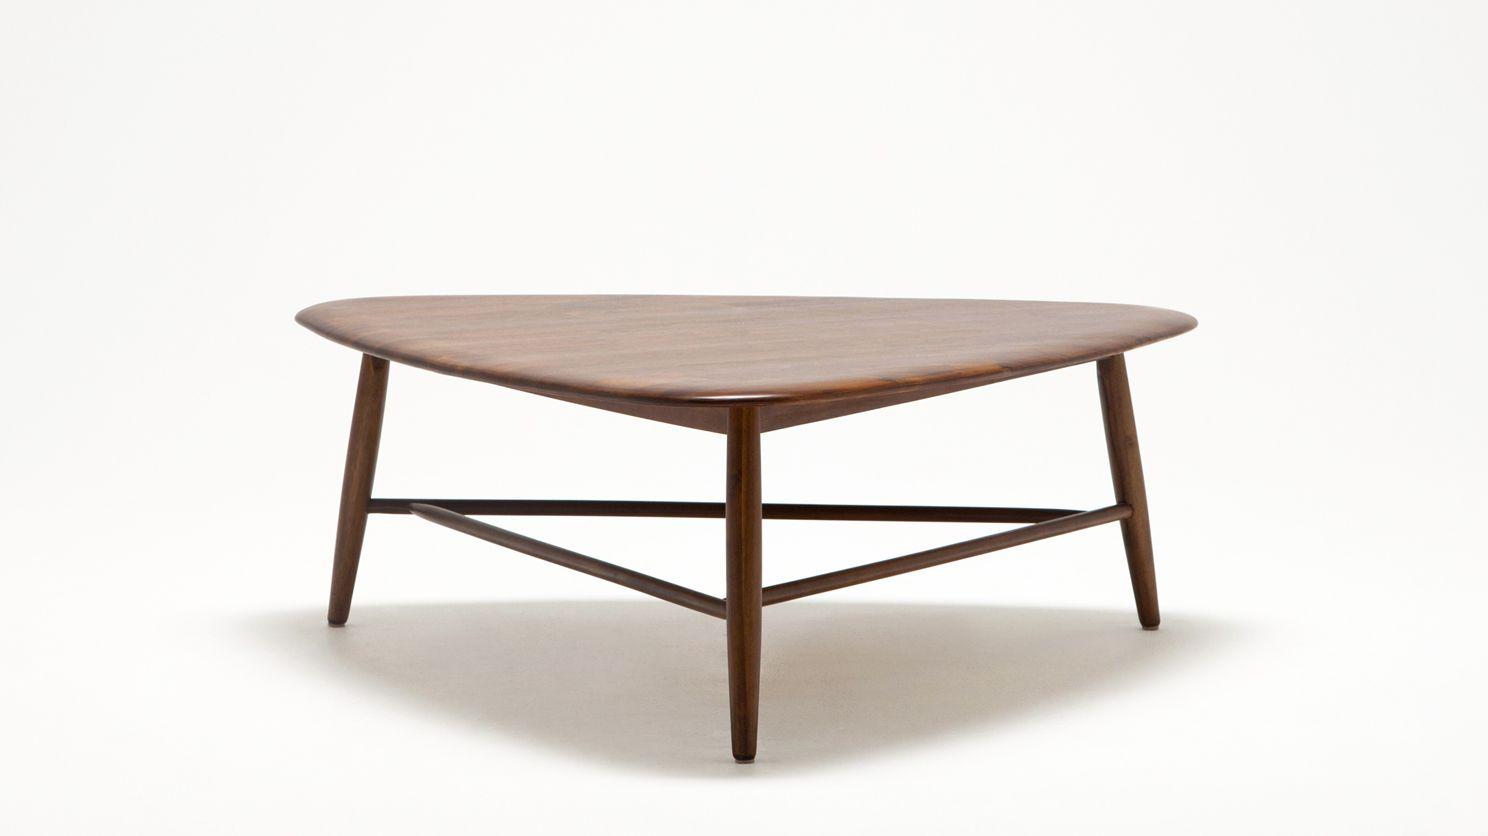 Kacia Tri Coffee Table 43 Eq3 Coffee Table Coffee Table Square Modern Glass Coffee Table [ 836 x 1488 Pixel ]